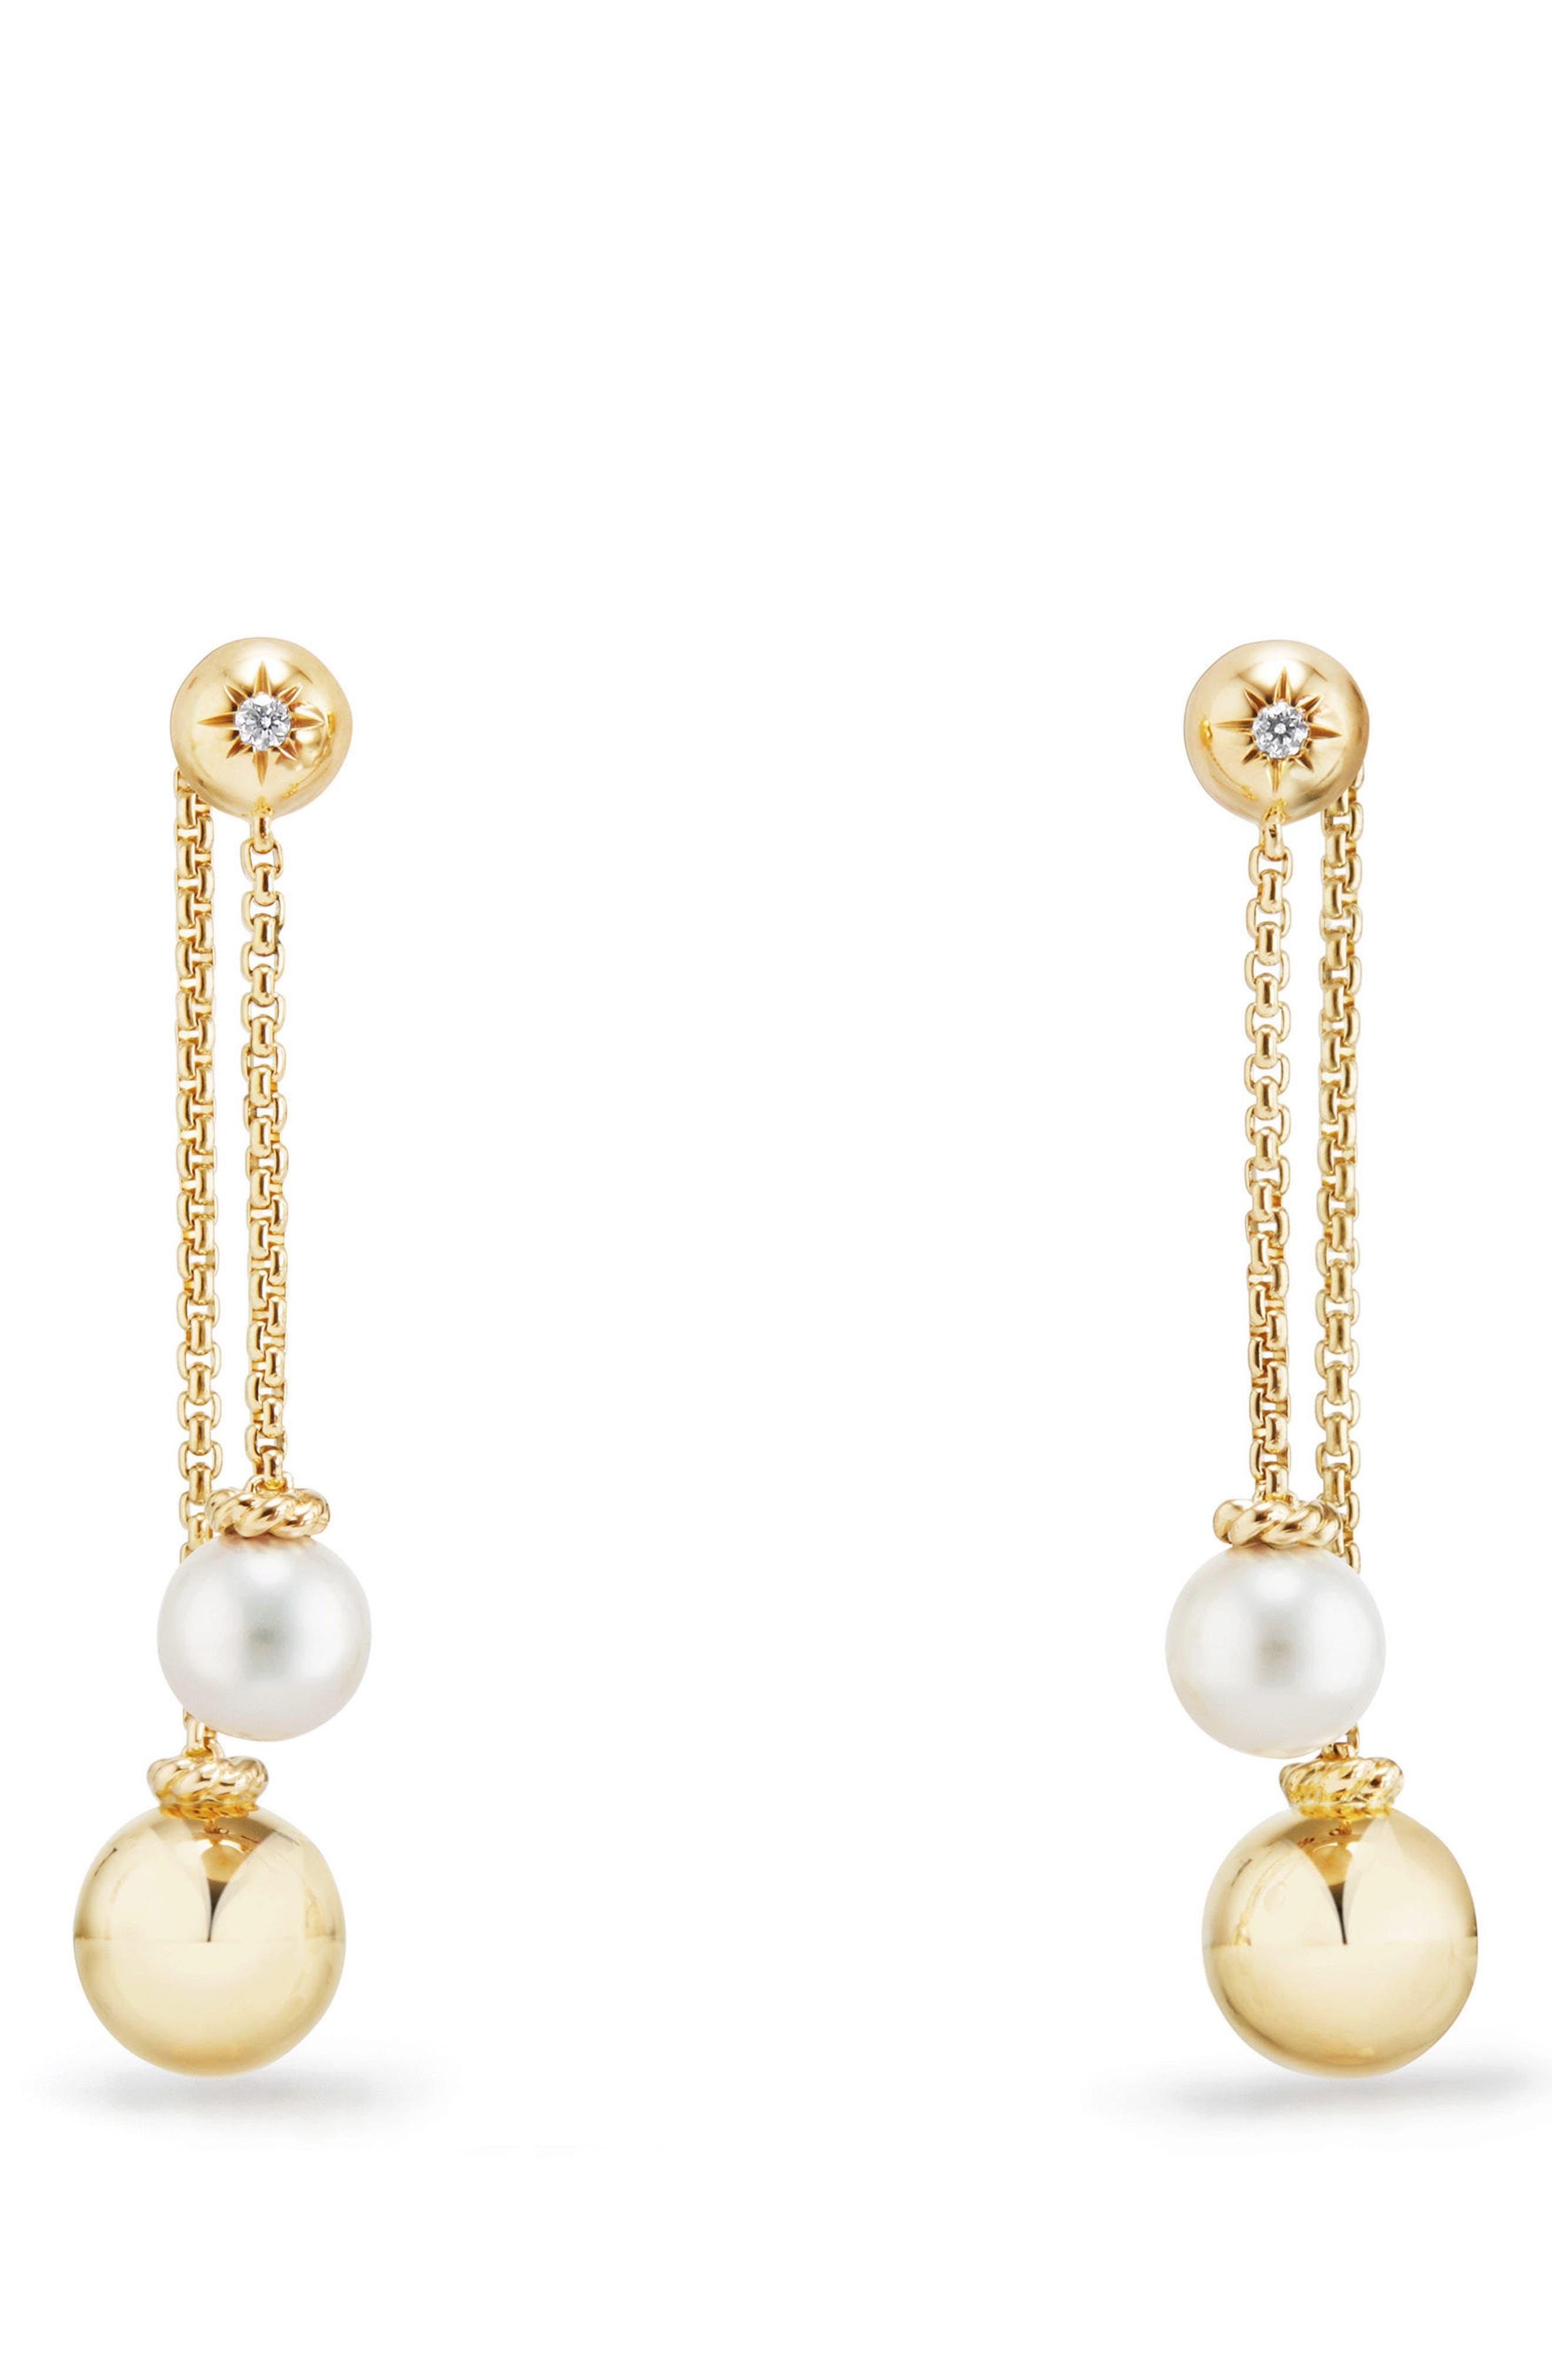 Alternate Image 1 Selected - David Yurman Solari Chain Drop Earrings with Diamonds in 18K Gold